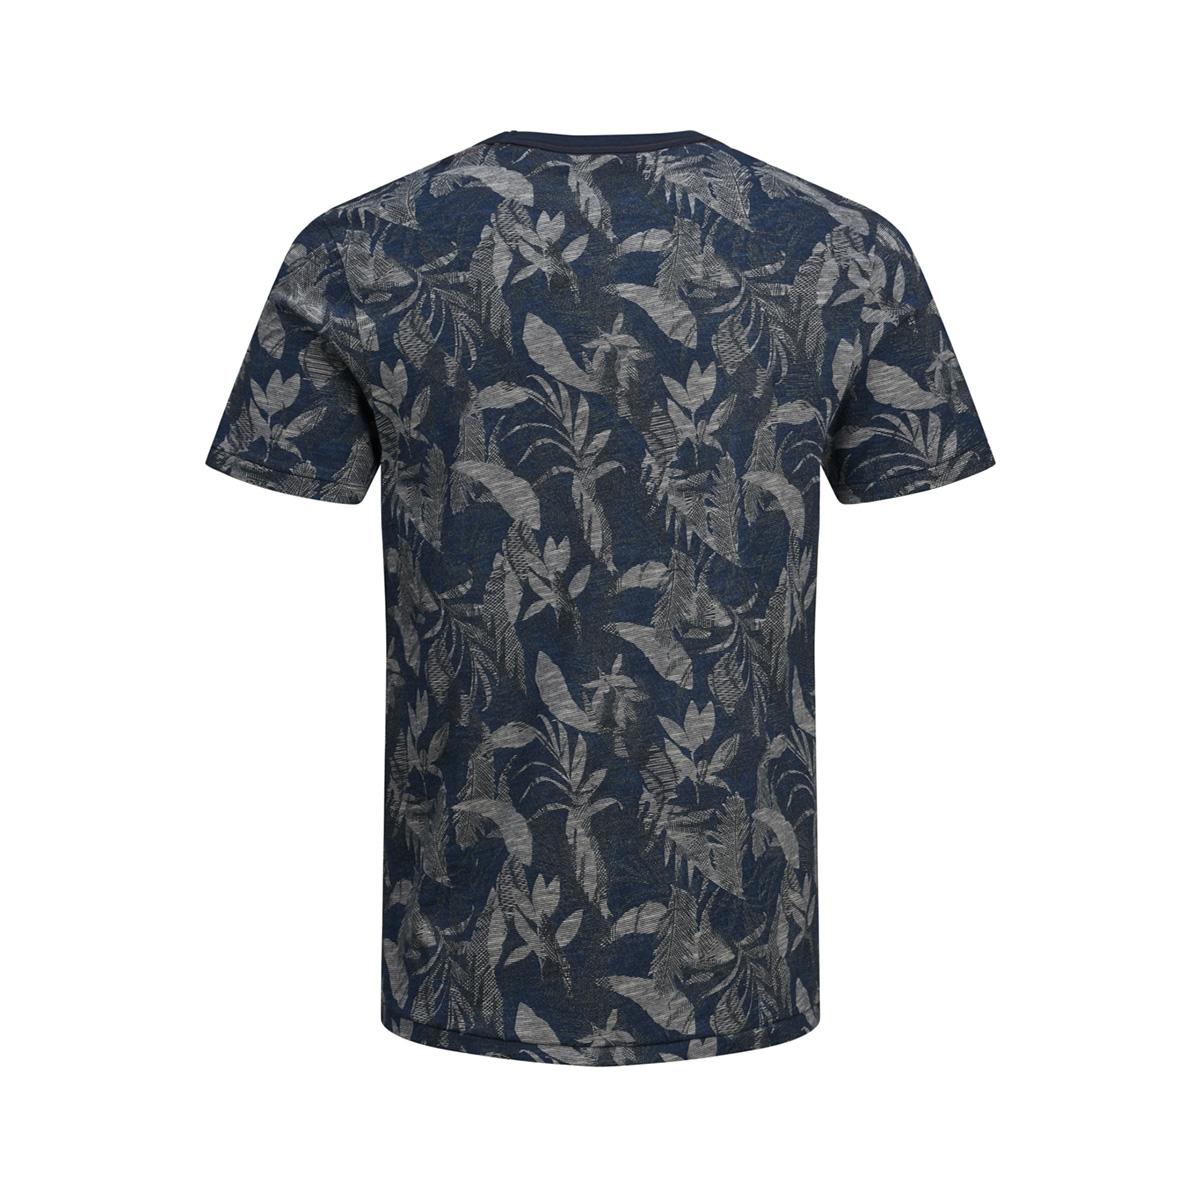 jprcaleb blu. tee ss crew neck 12152276 jack & jones t-shirt estate blue